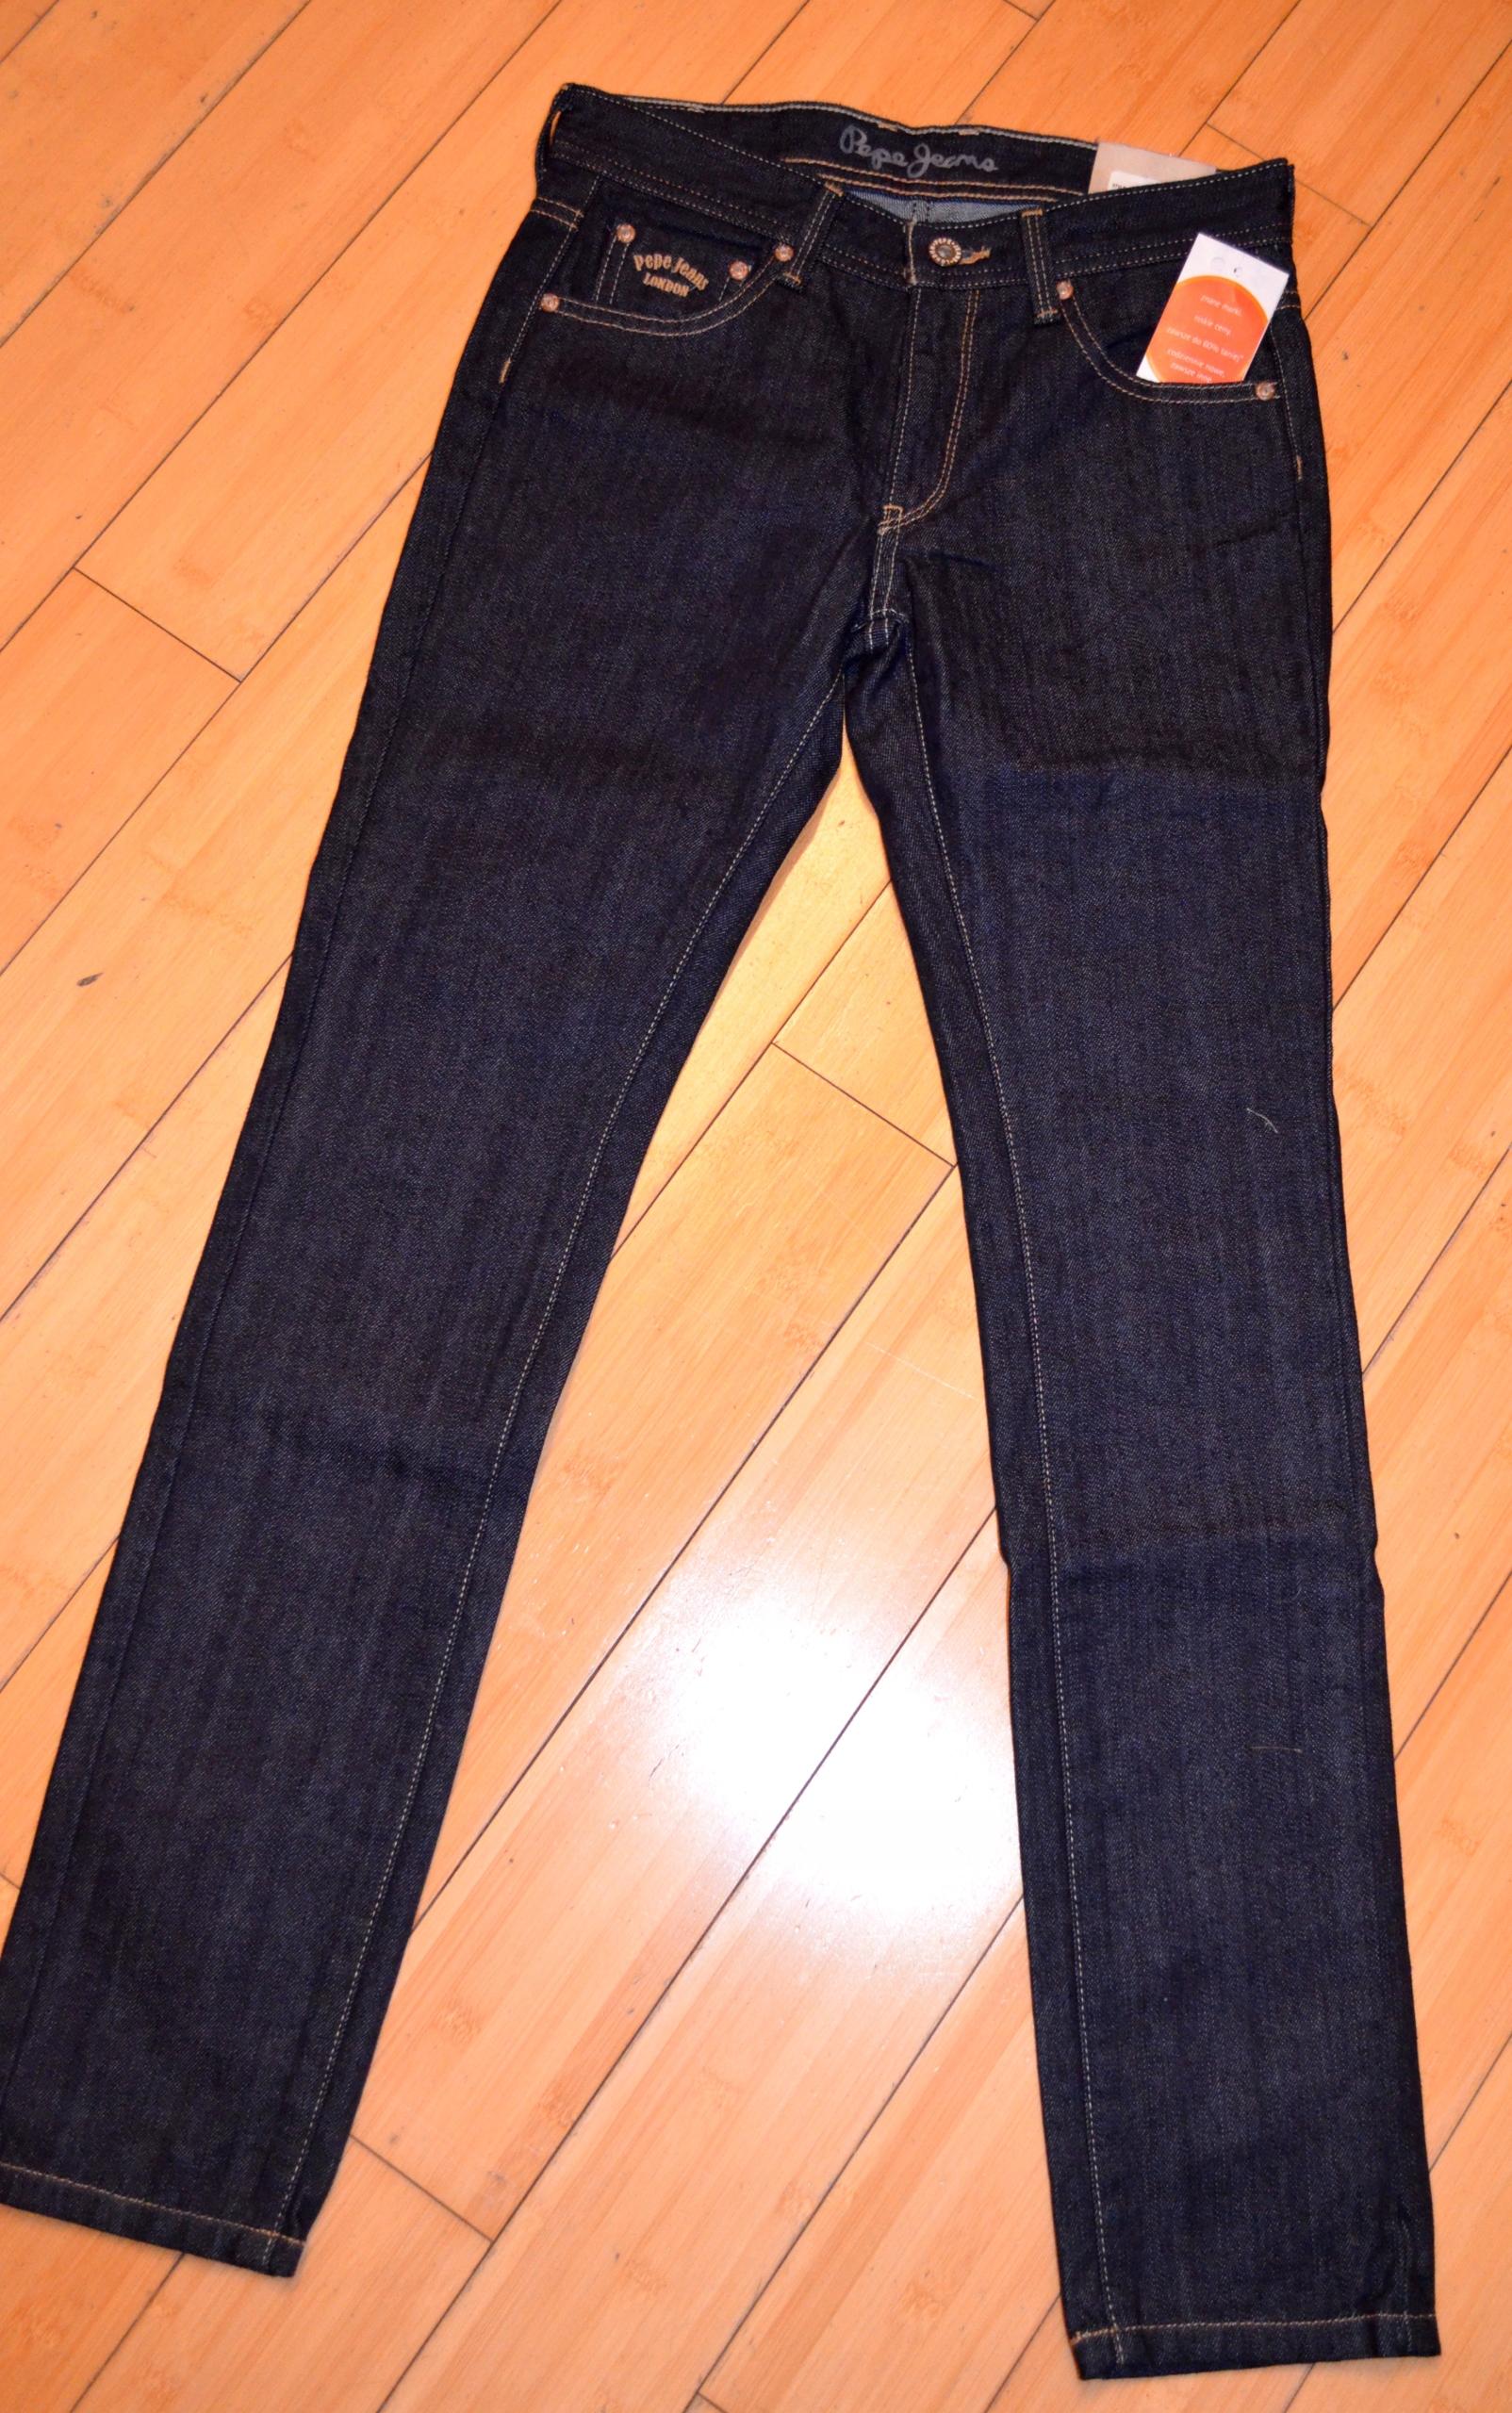 Spodnie jeansy ZARA- Pepe Jeans rozmiar 152/12 lat